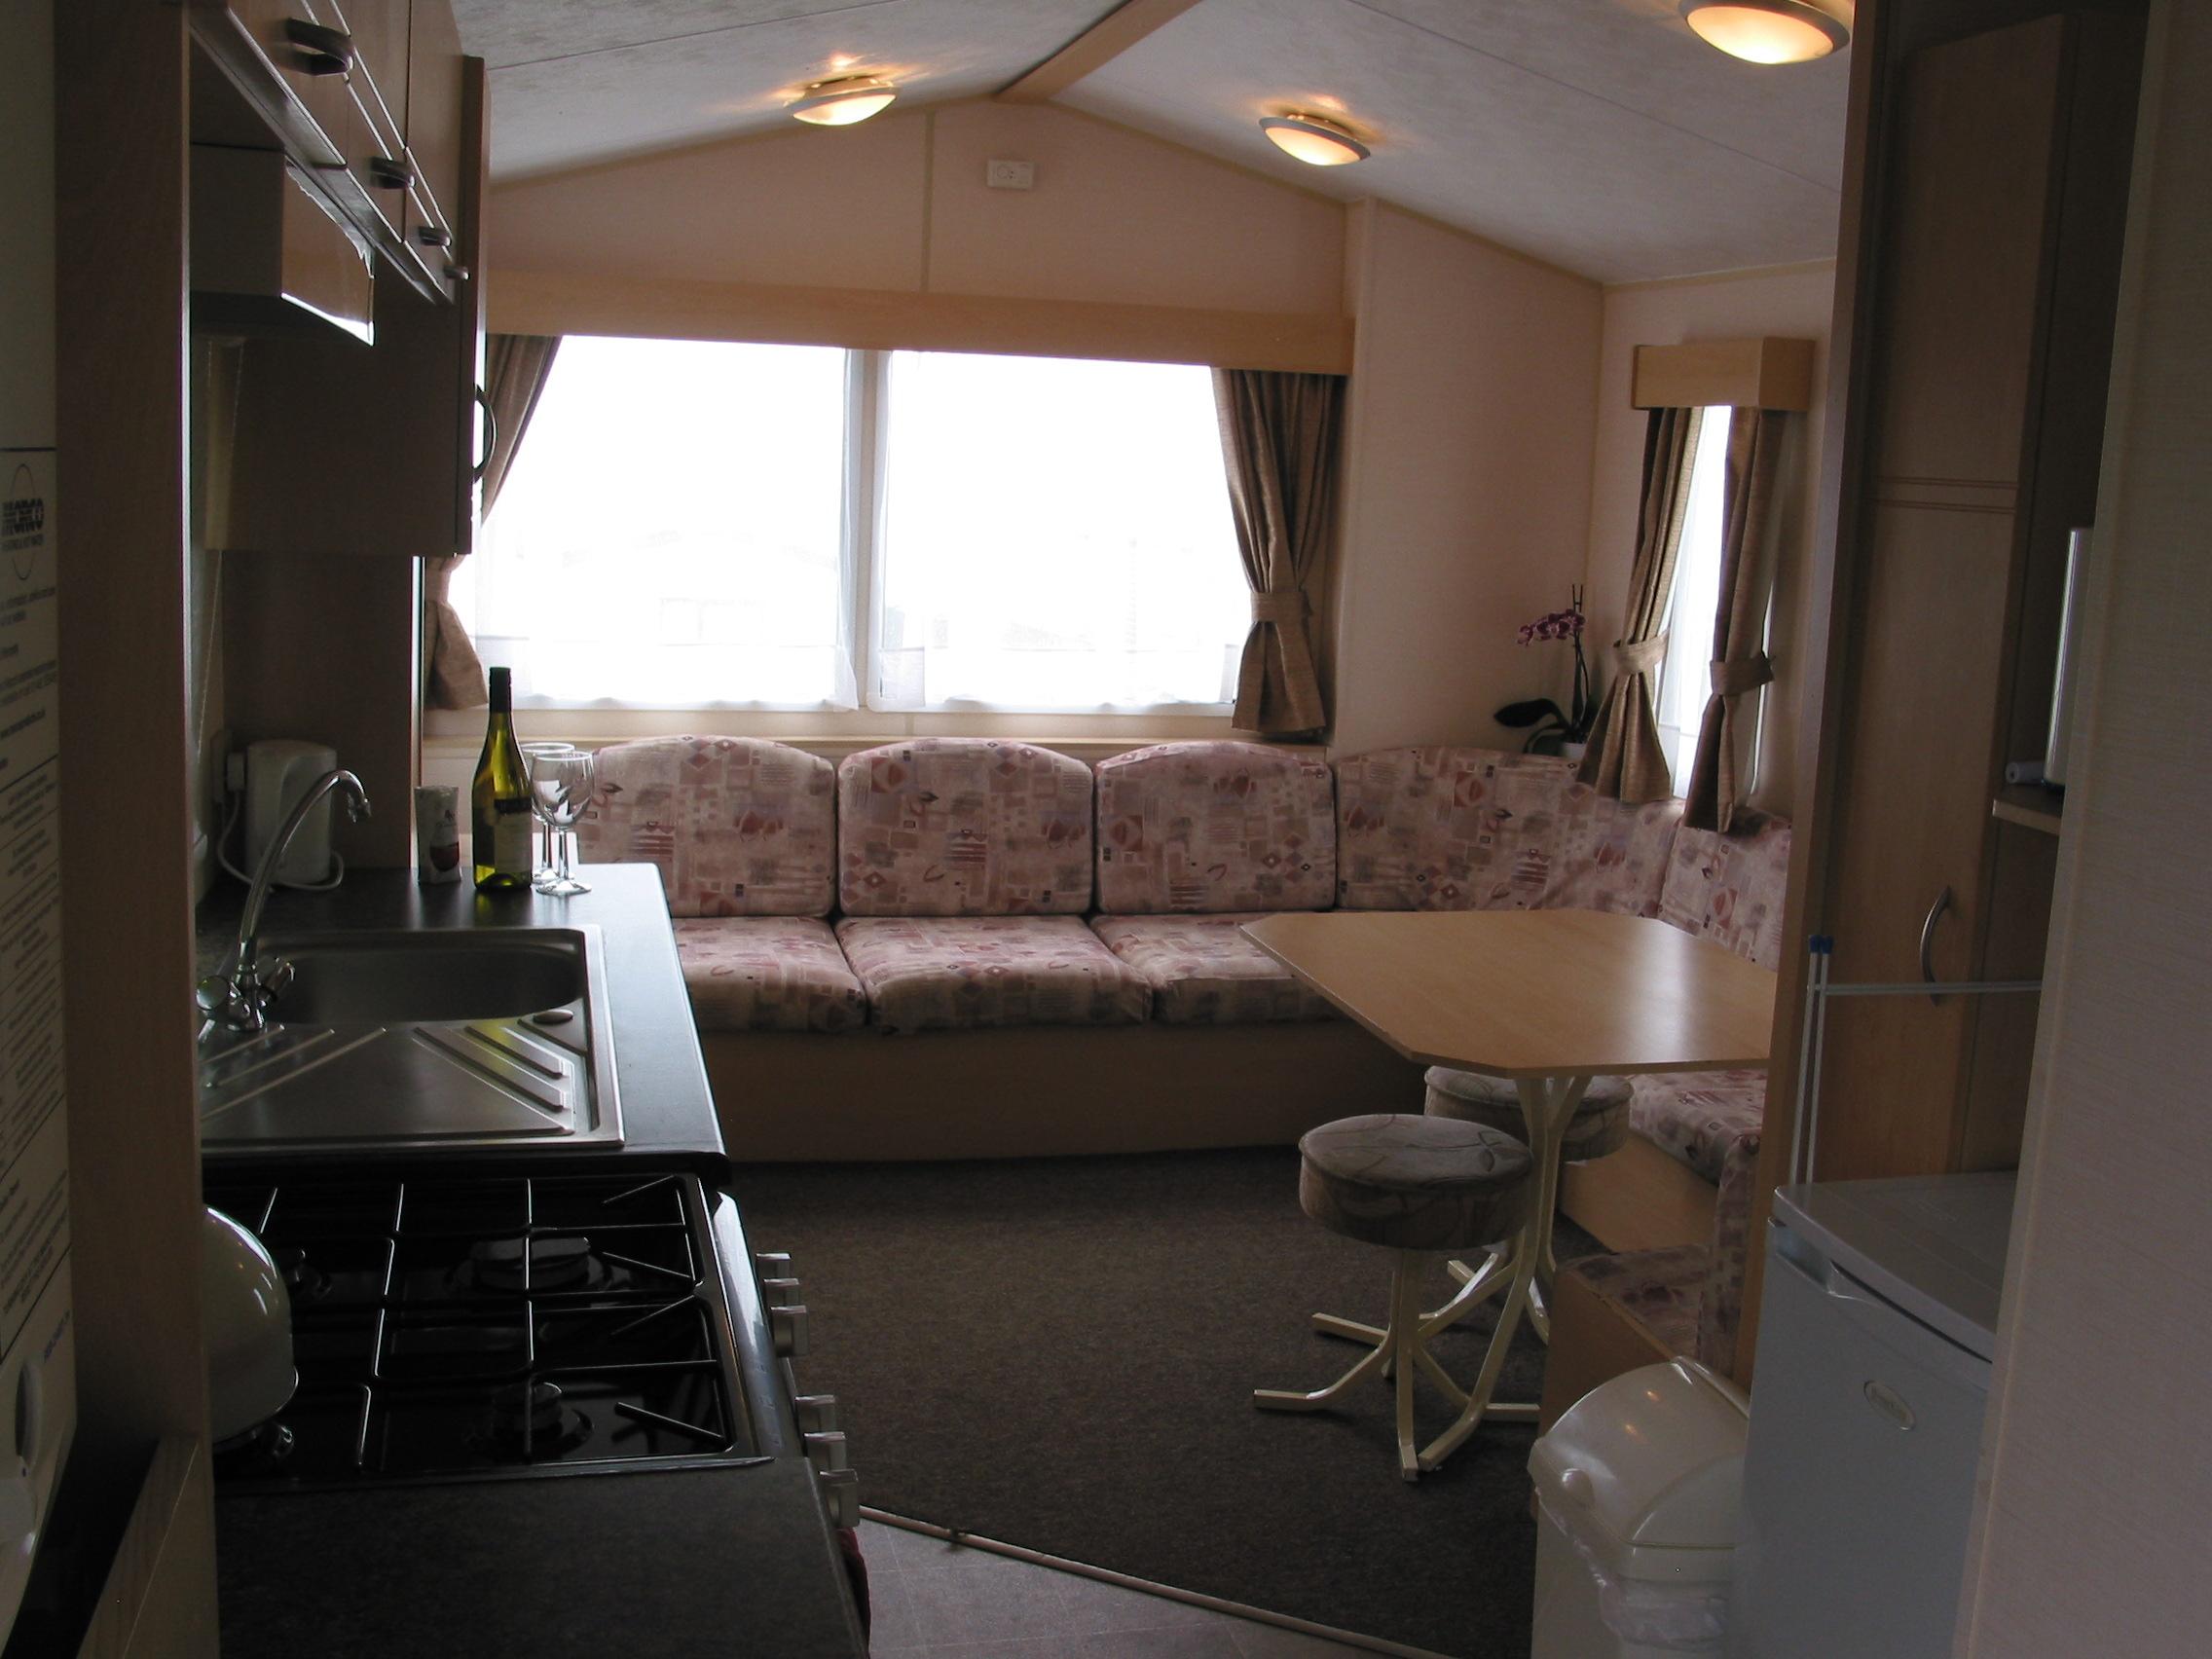 CV 54 living room